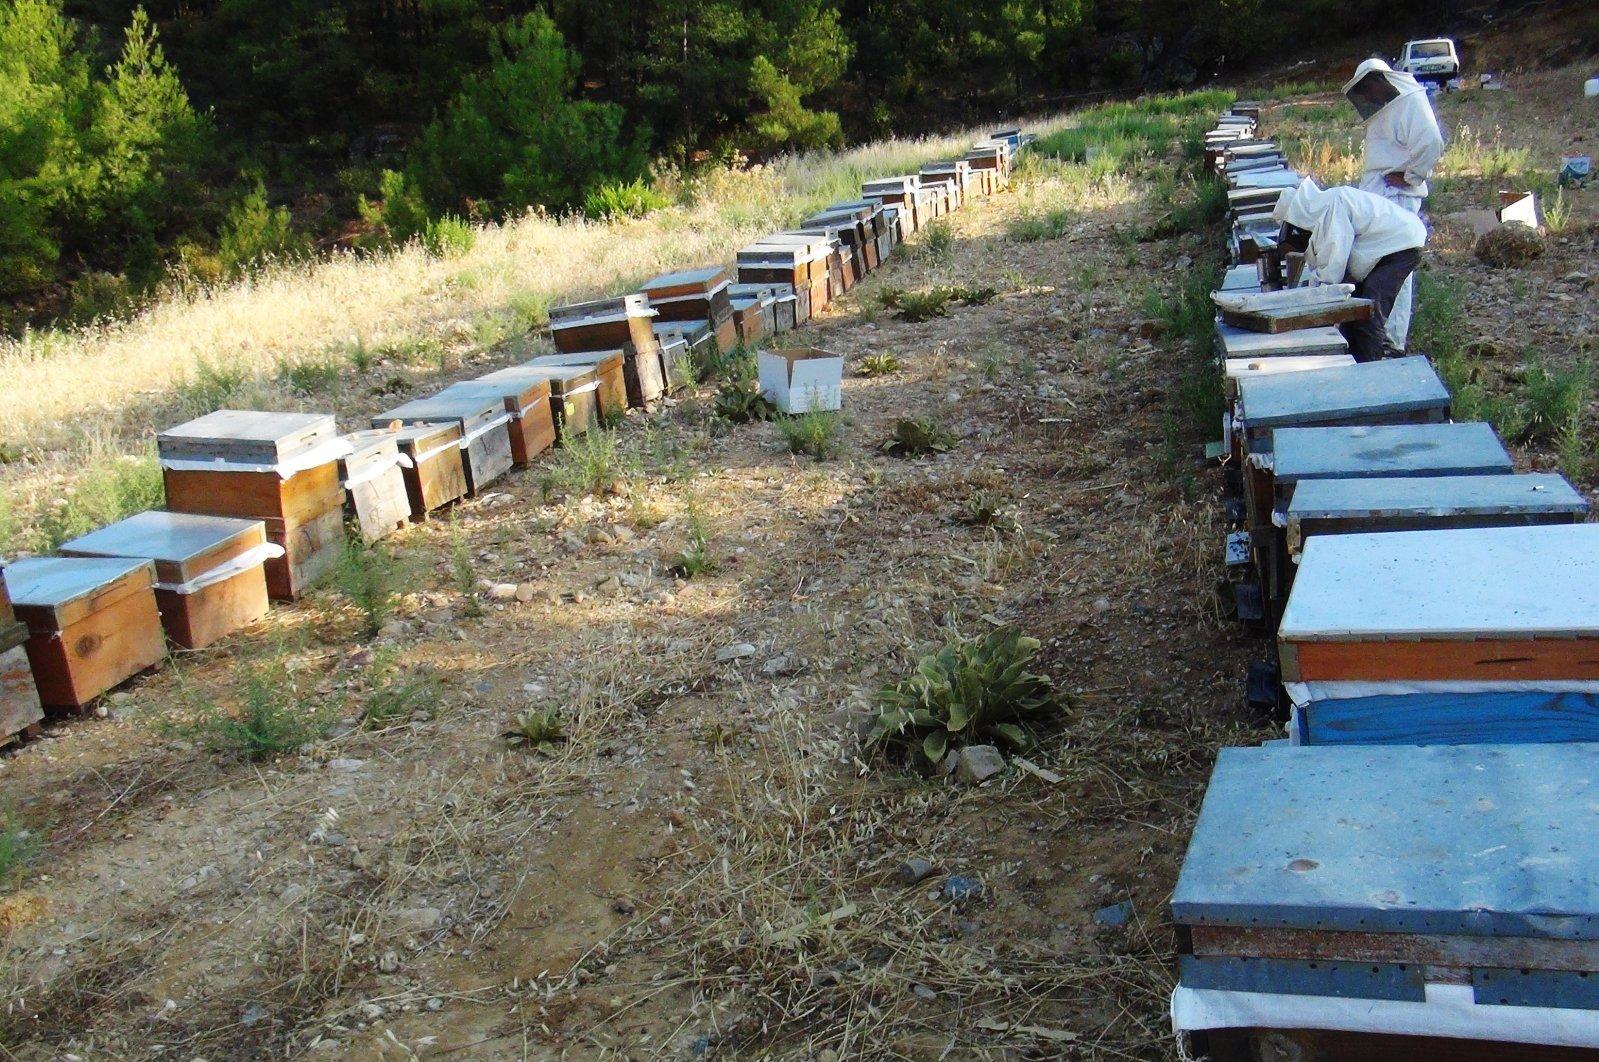 Beekeepers attend beehives in a forest in Muğla, southwestern Turkey, Sept. 7, 2021. (İHA PHOTO)